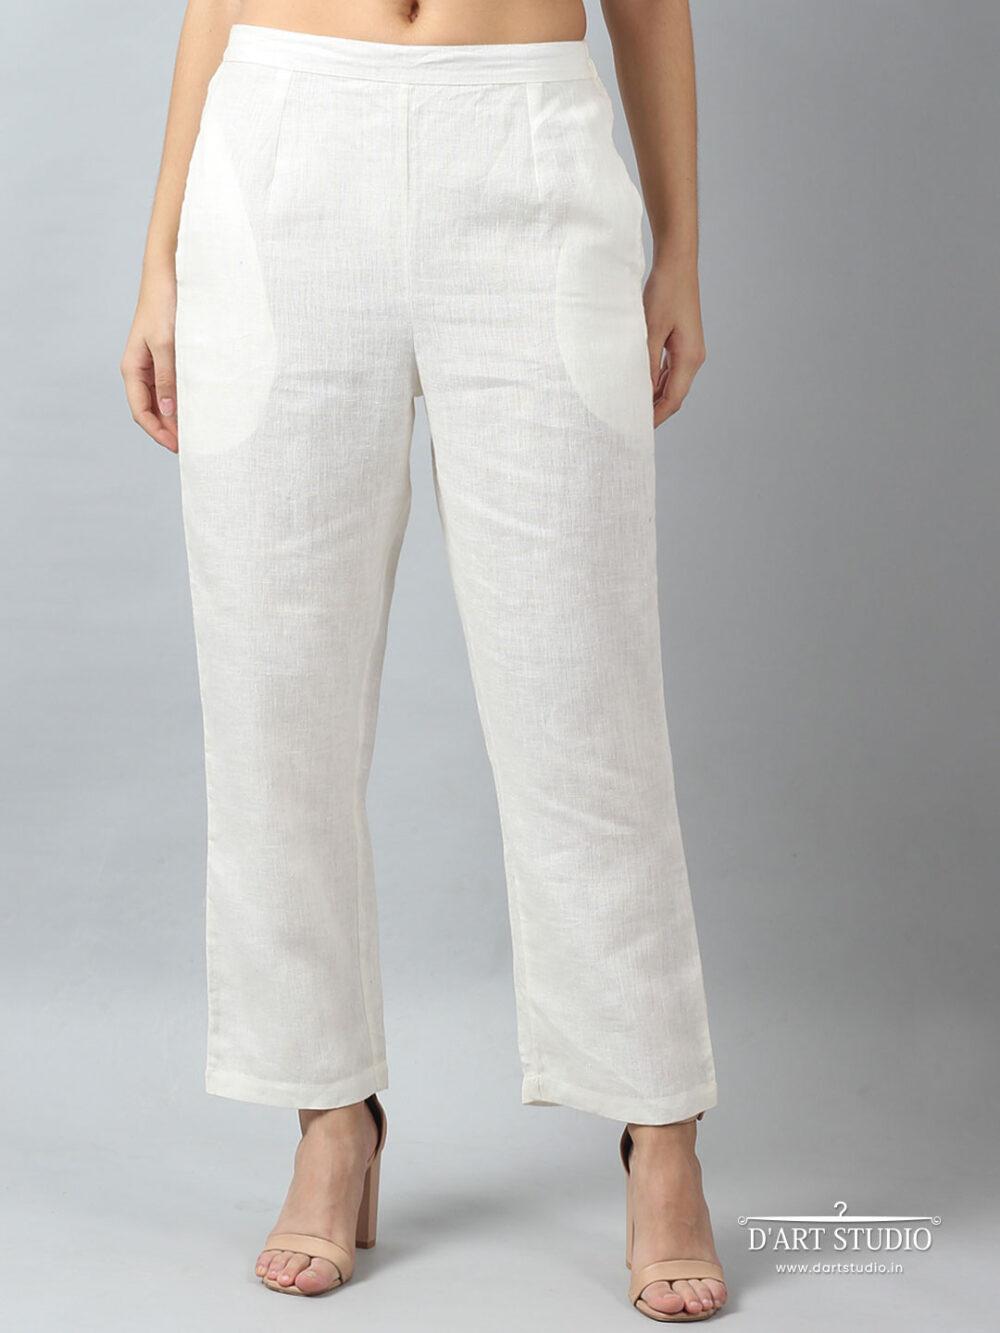 Hand Embroidered White Linen Pants DARTSTUDIO4052